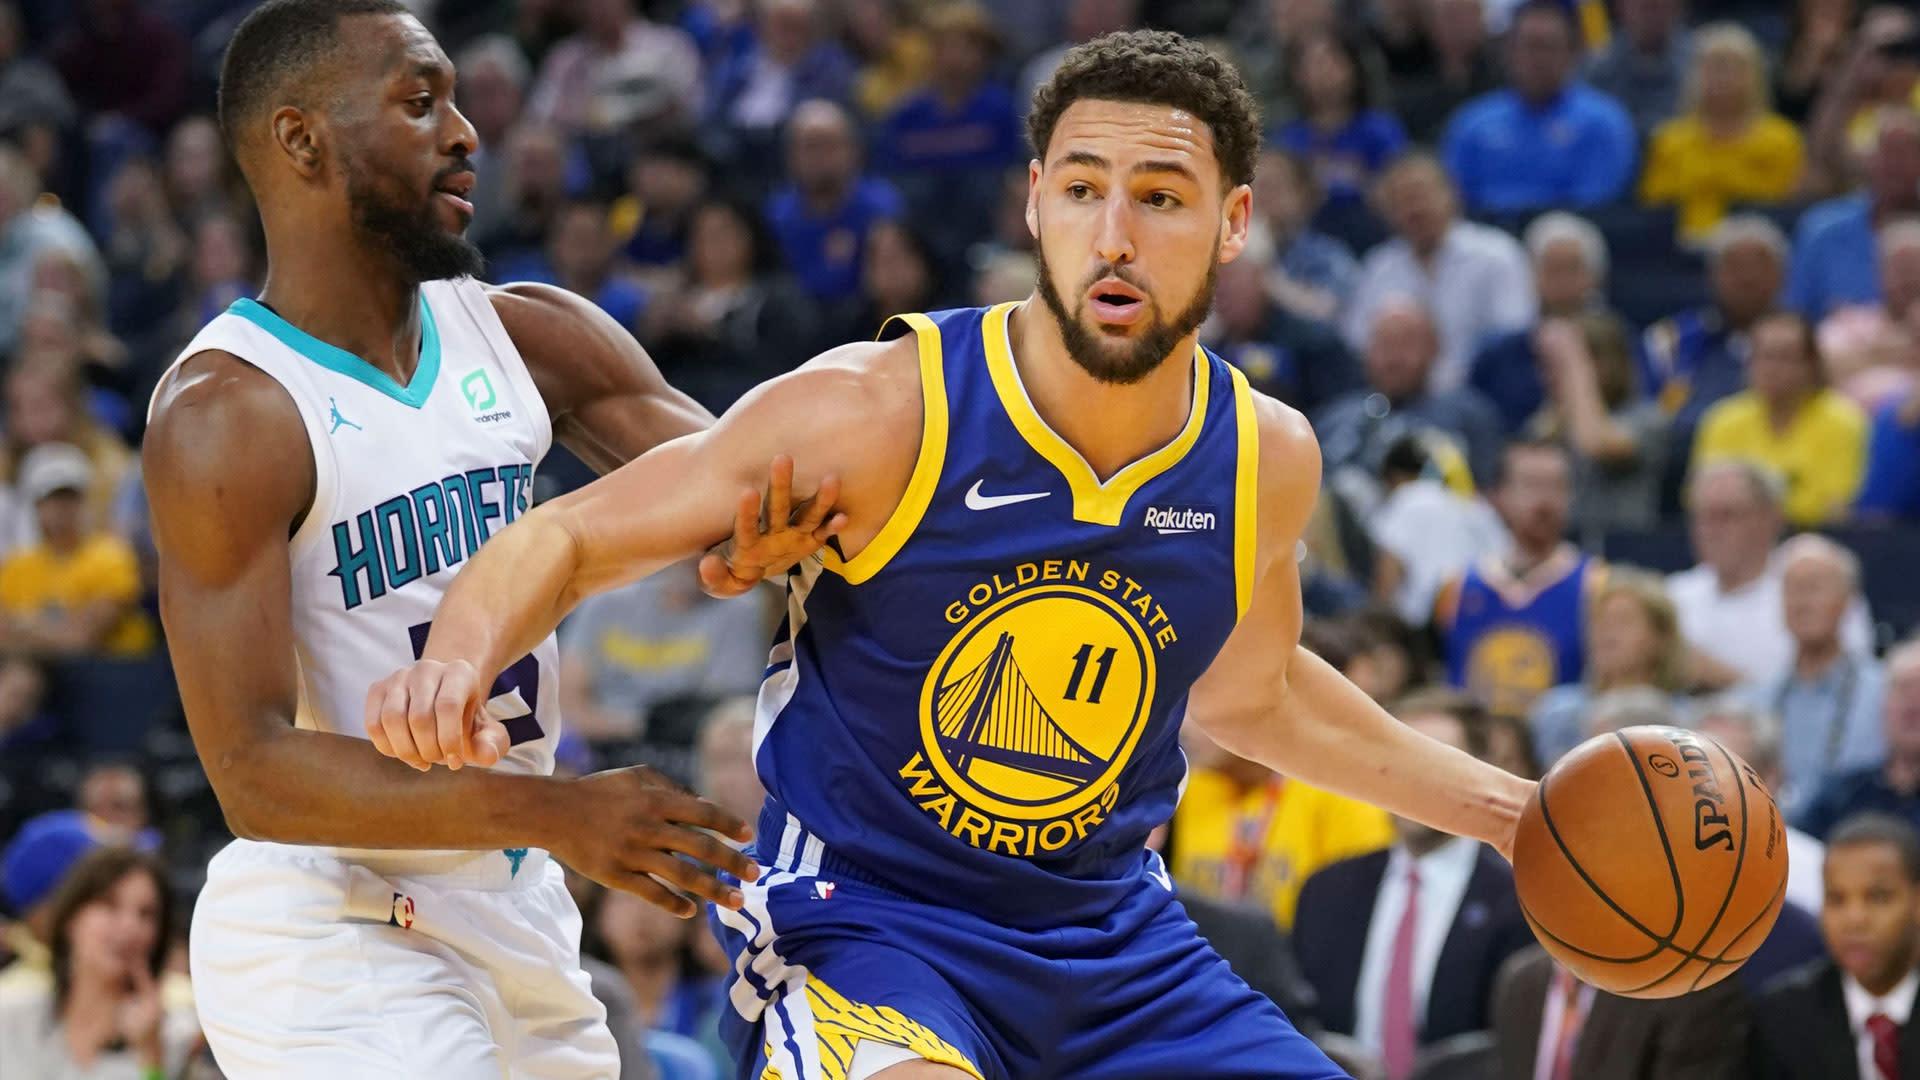 Klay Thompson's All-NBA team snub is fair, even though it seems unfair